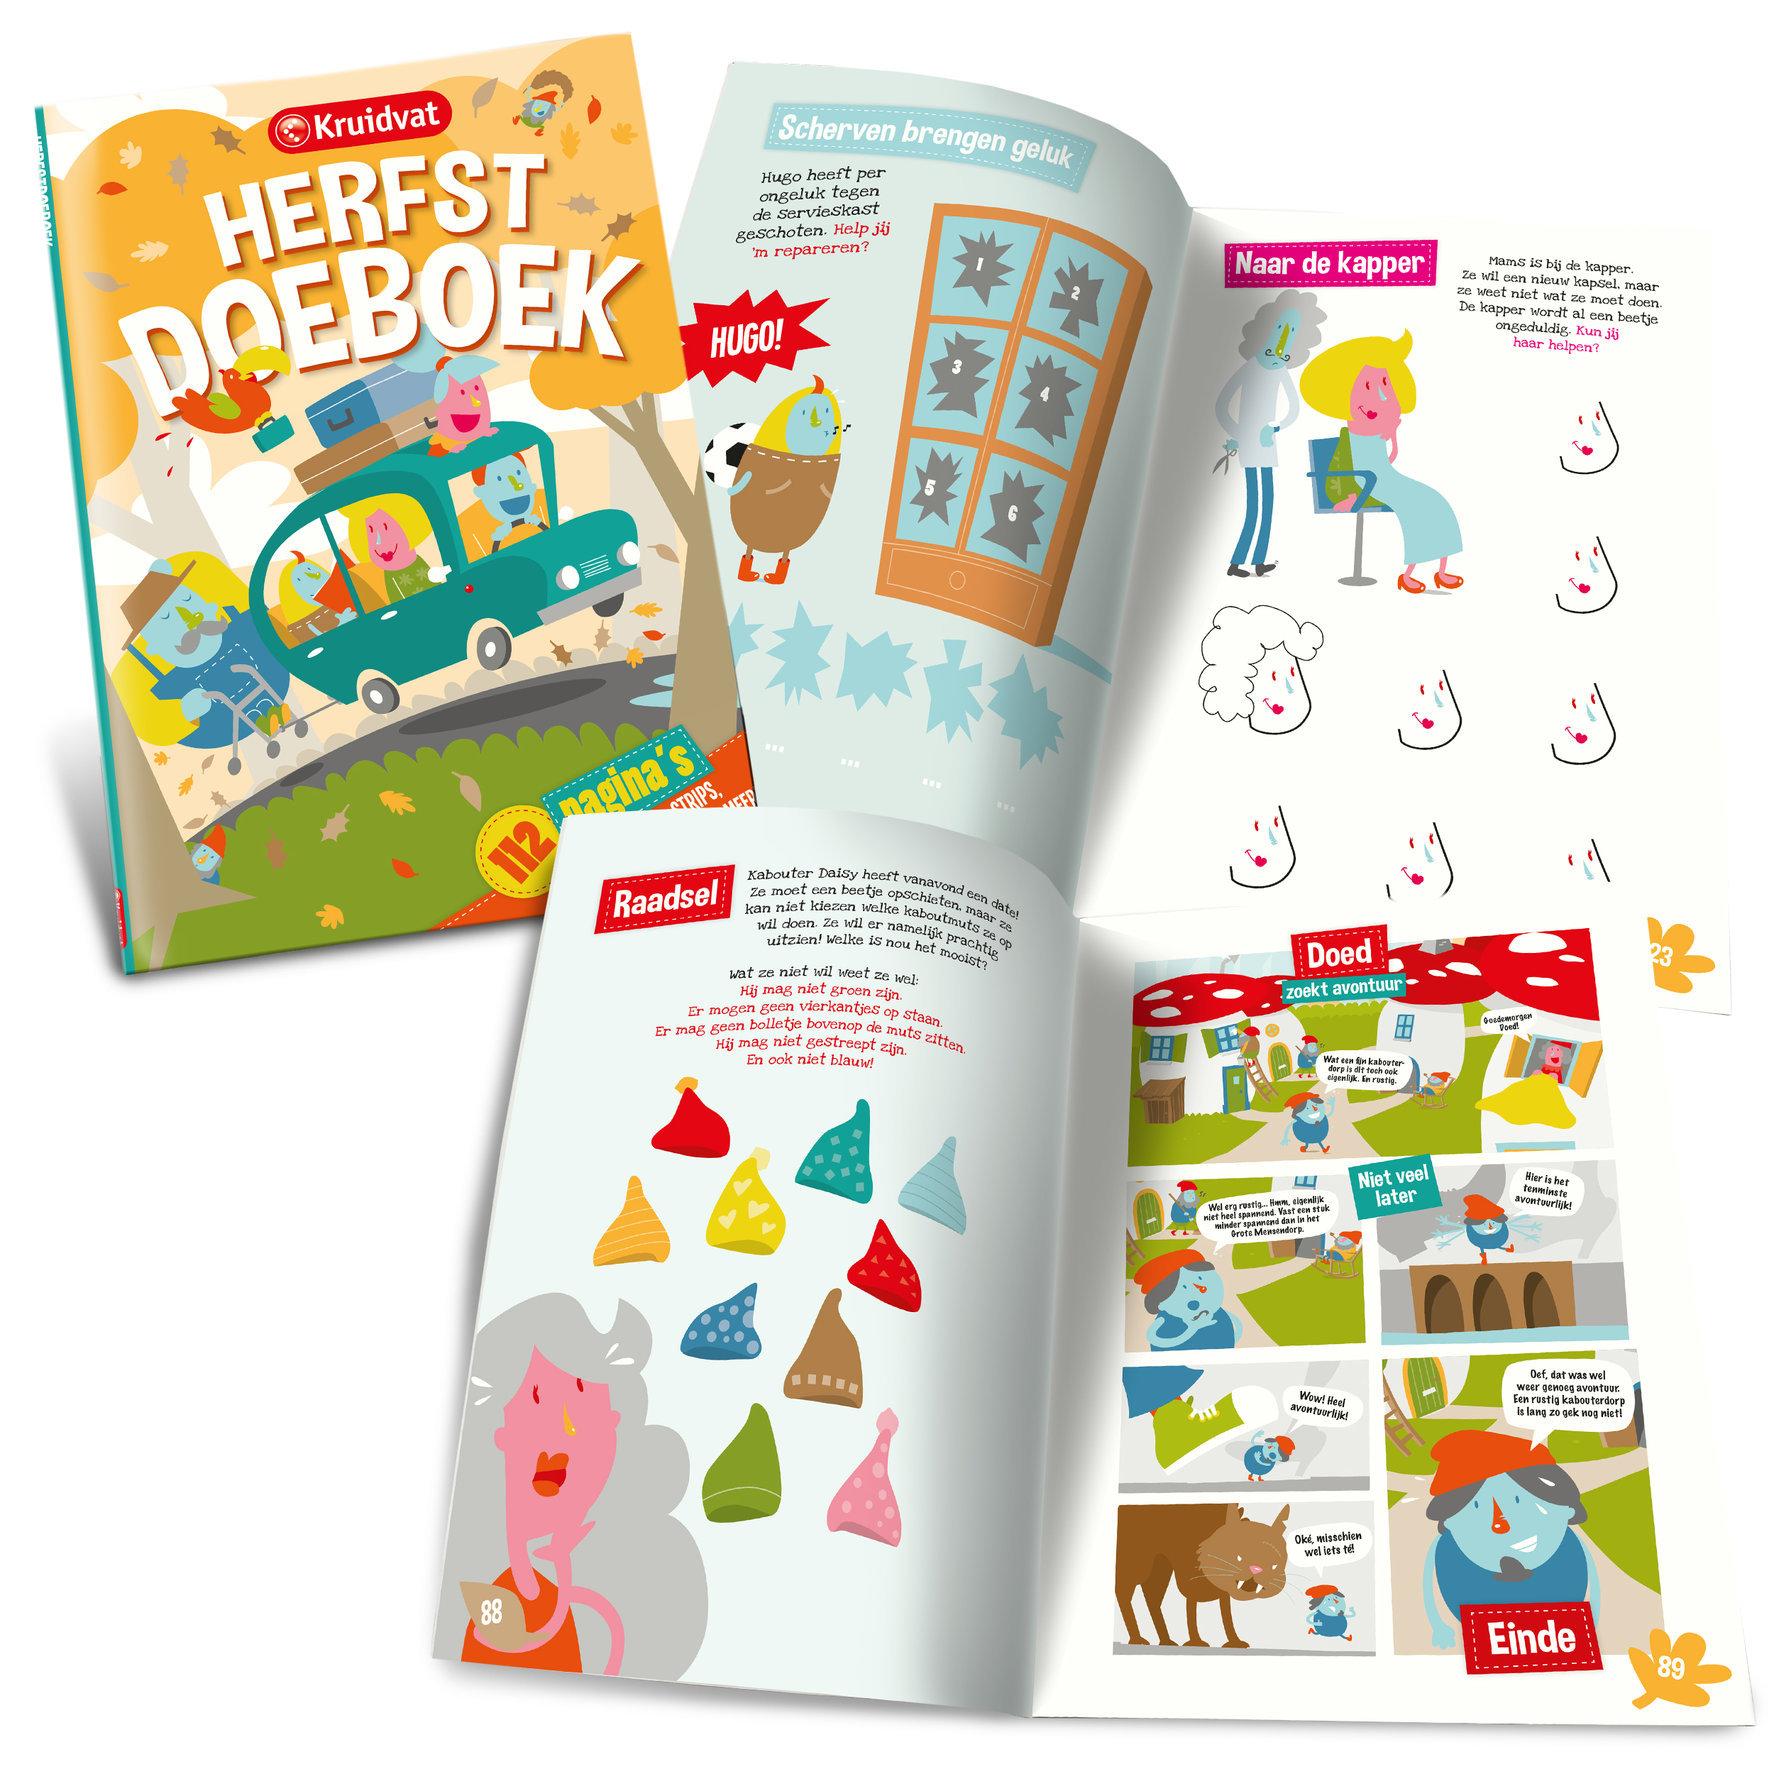 Kruidvat Herfst doeboek | publicaties